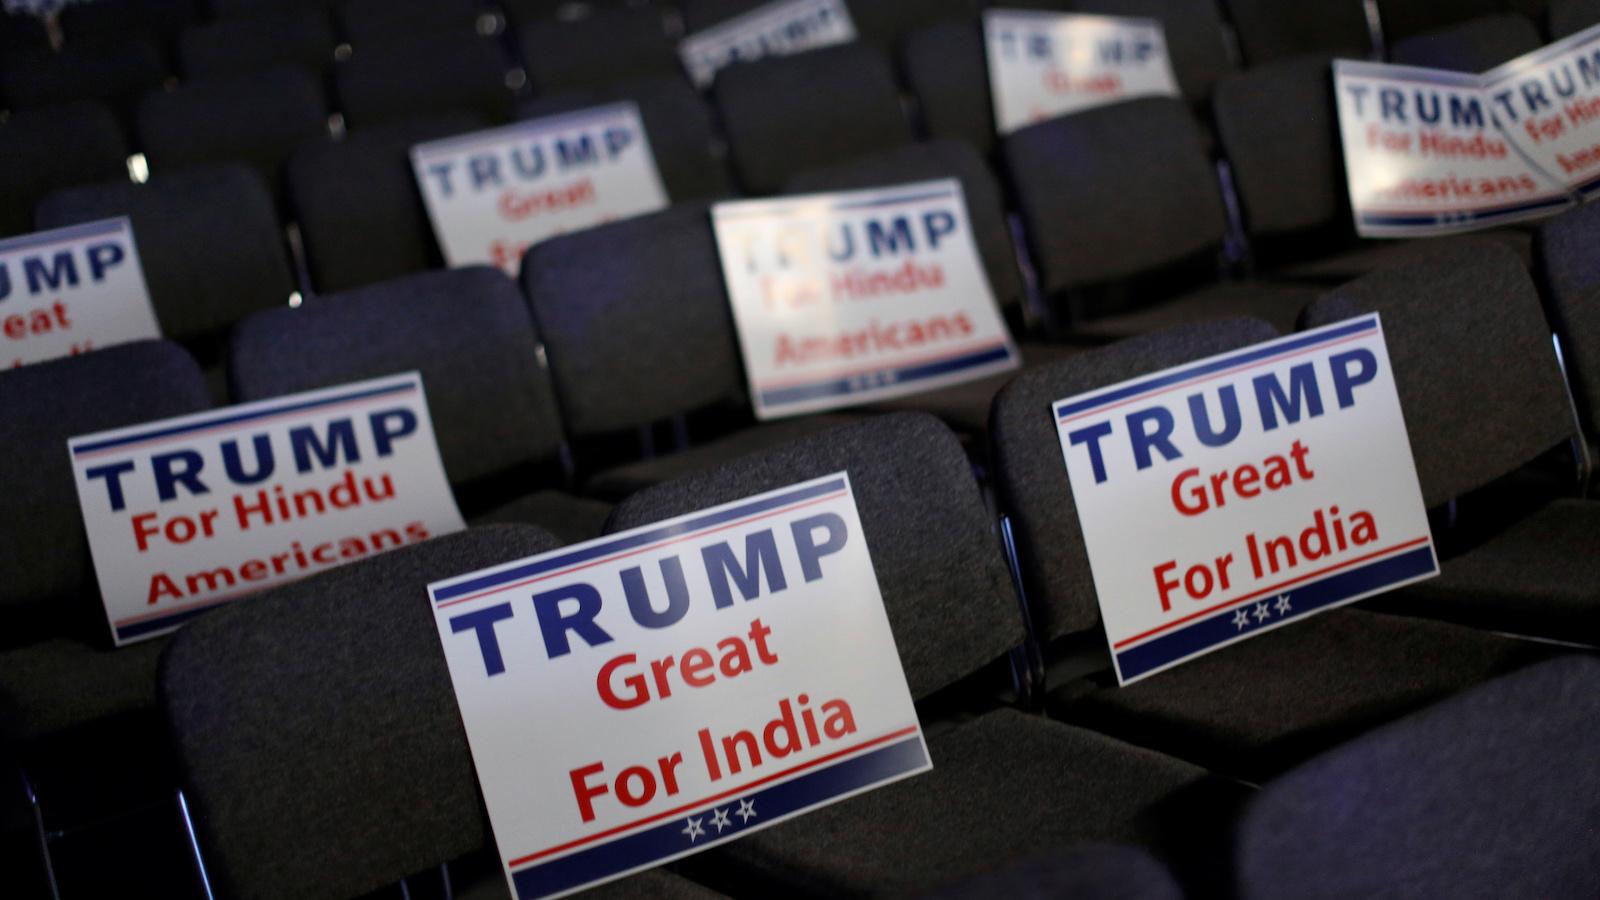 Donald Trump-Obama-Narendra Modi-Hindu-India